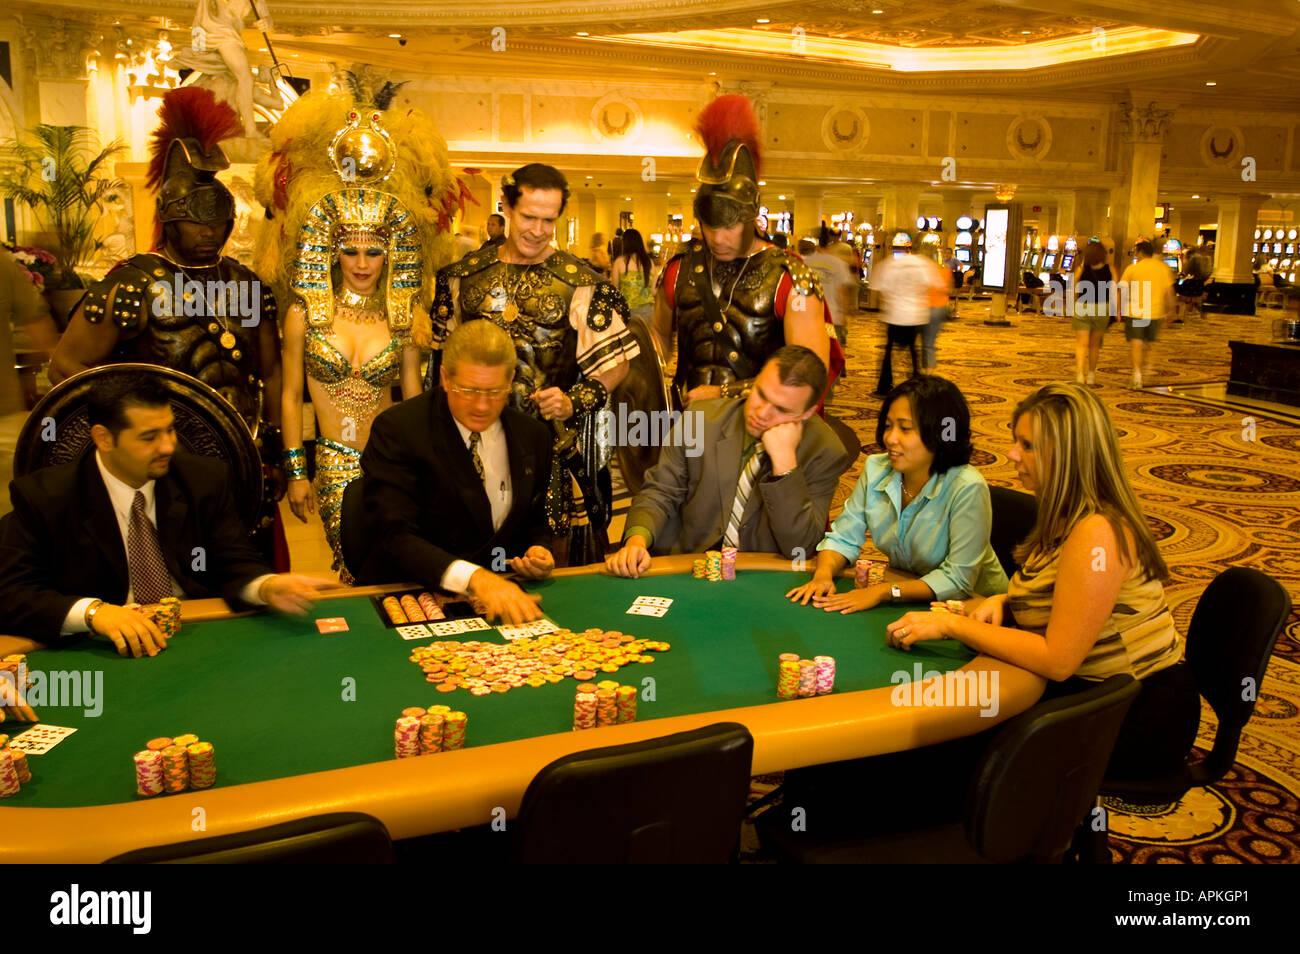 Nevada Caesars Palace and Casino gaming gambling poker model released NV Las Vegas Caesar Palace Guards Cleopatra actor - Stock Image